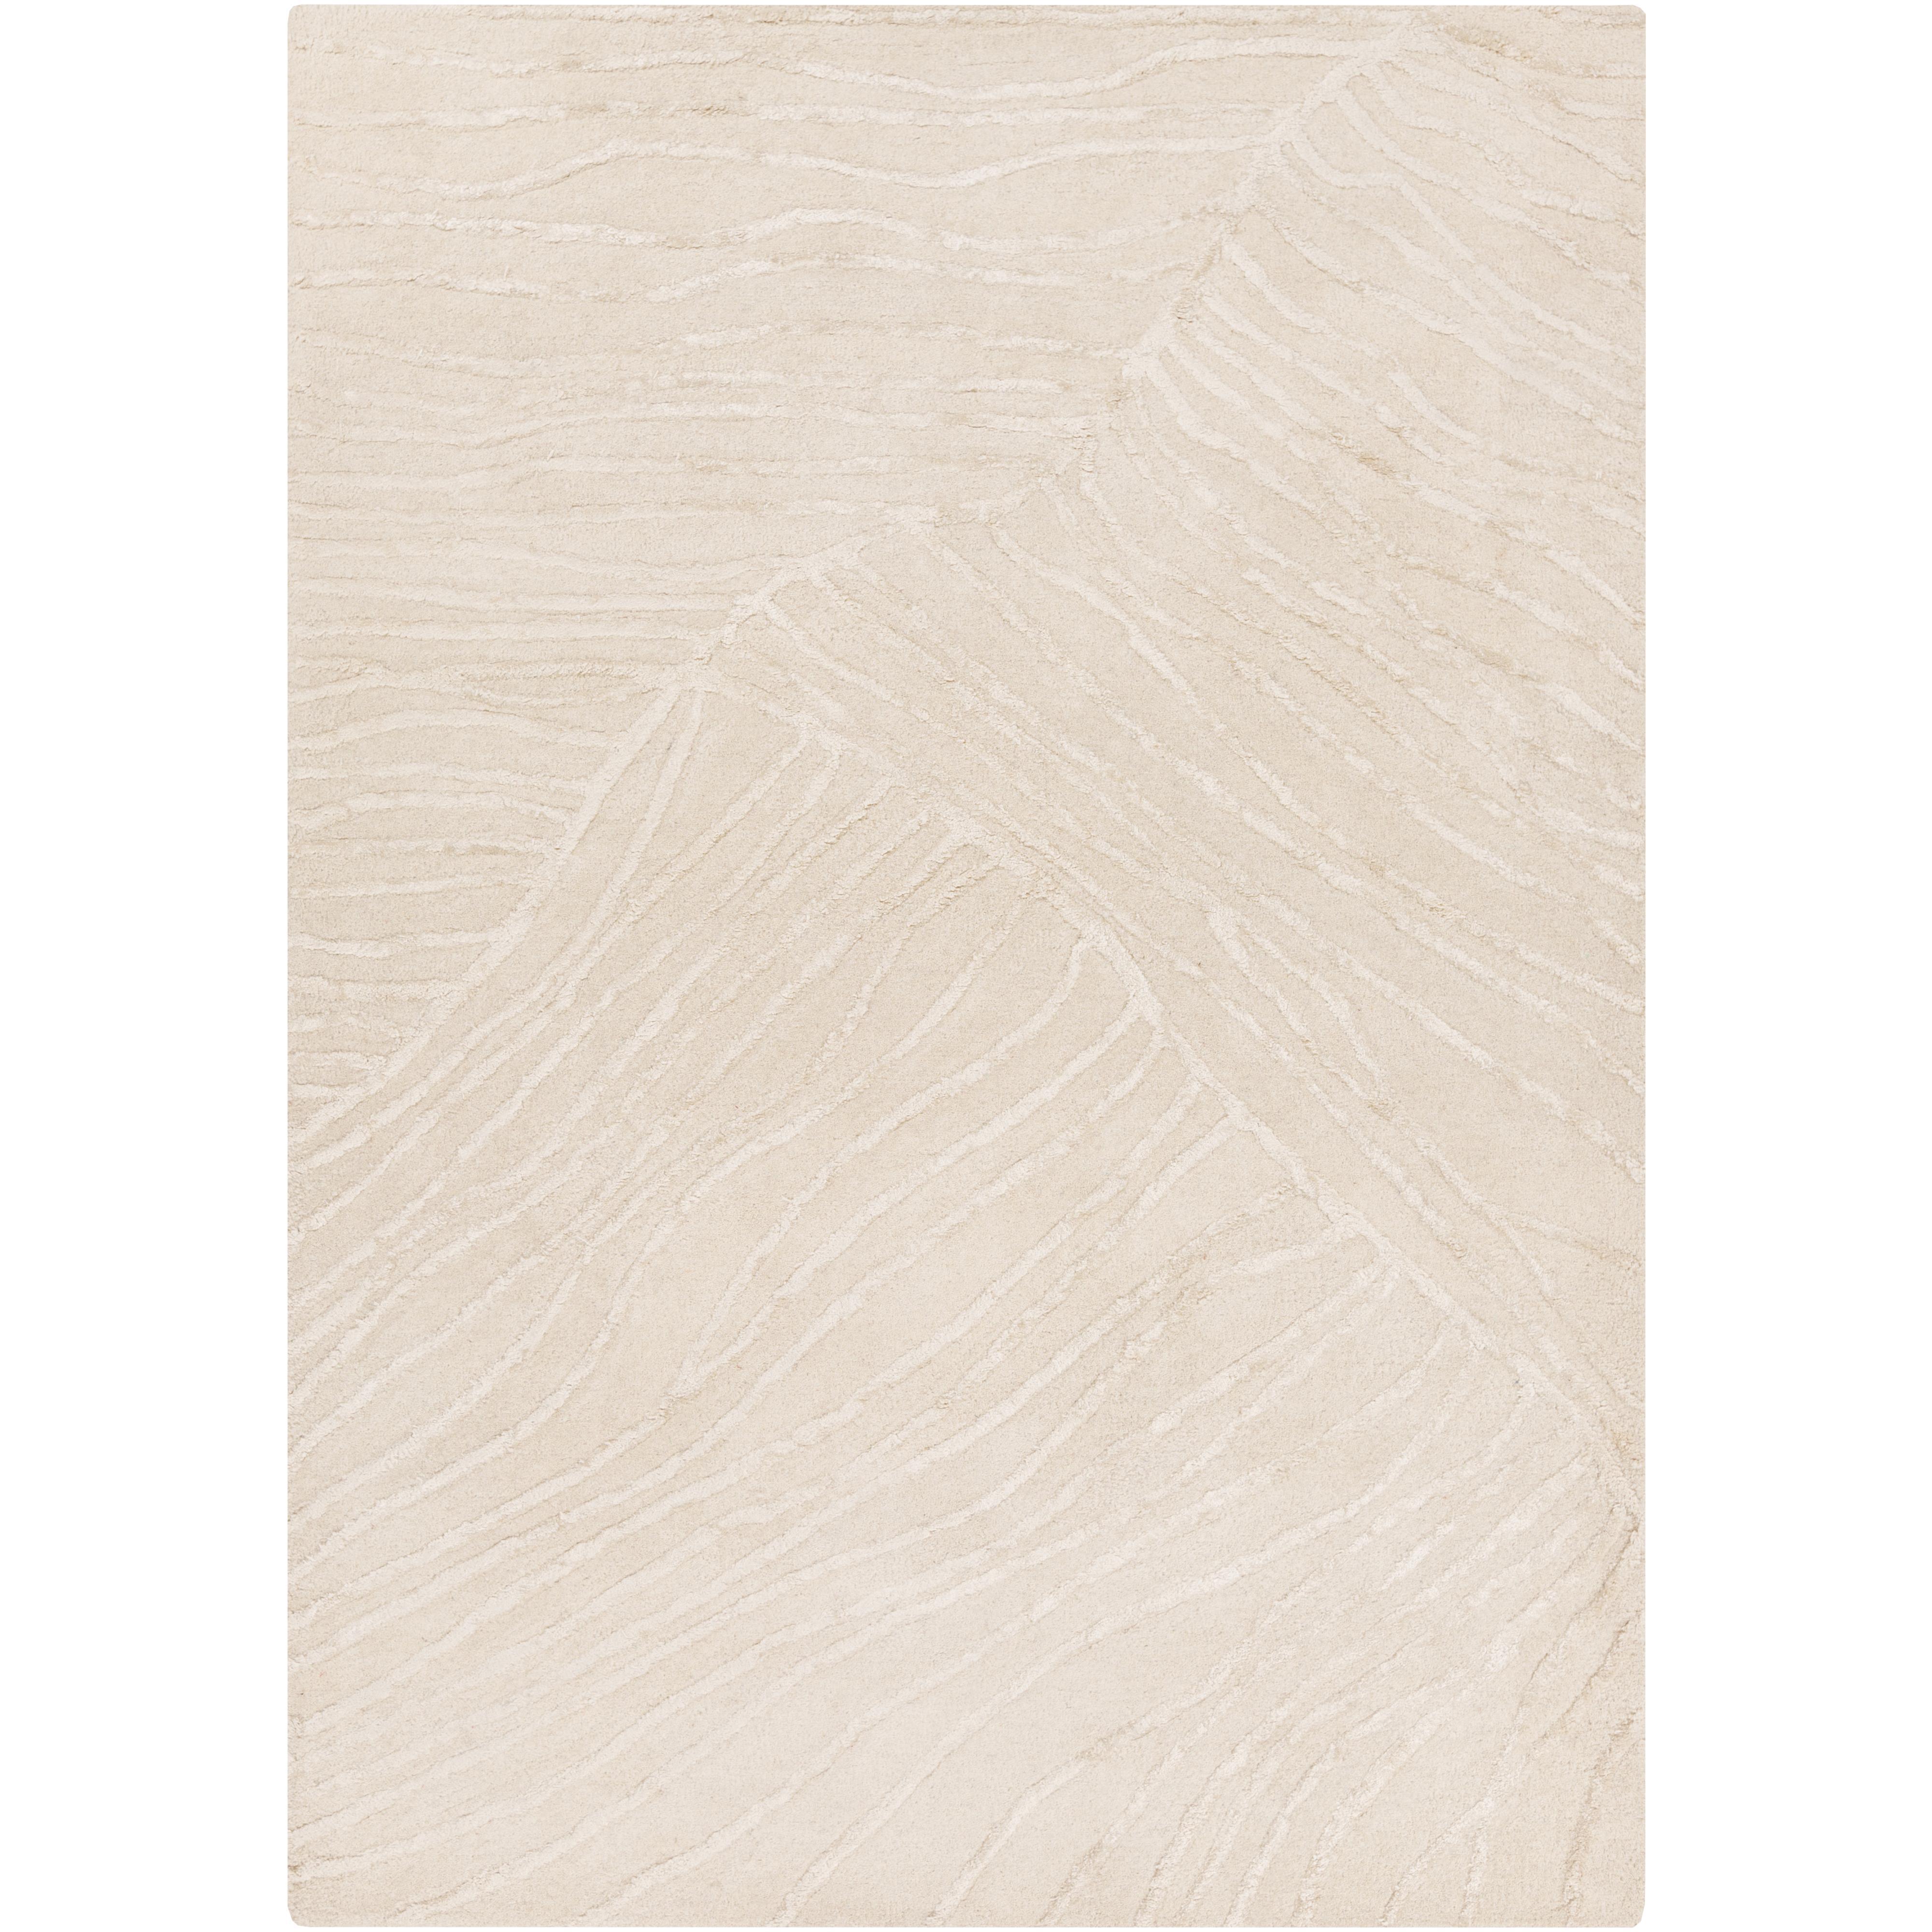 Surya Rugs Tamira 8' x 11' - Item Number: TAM1046-811